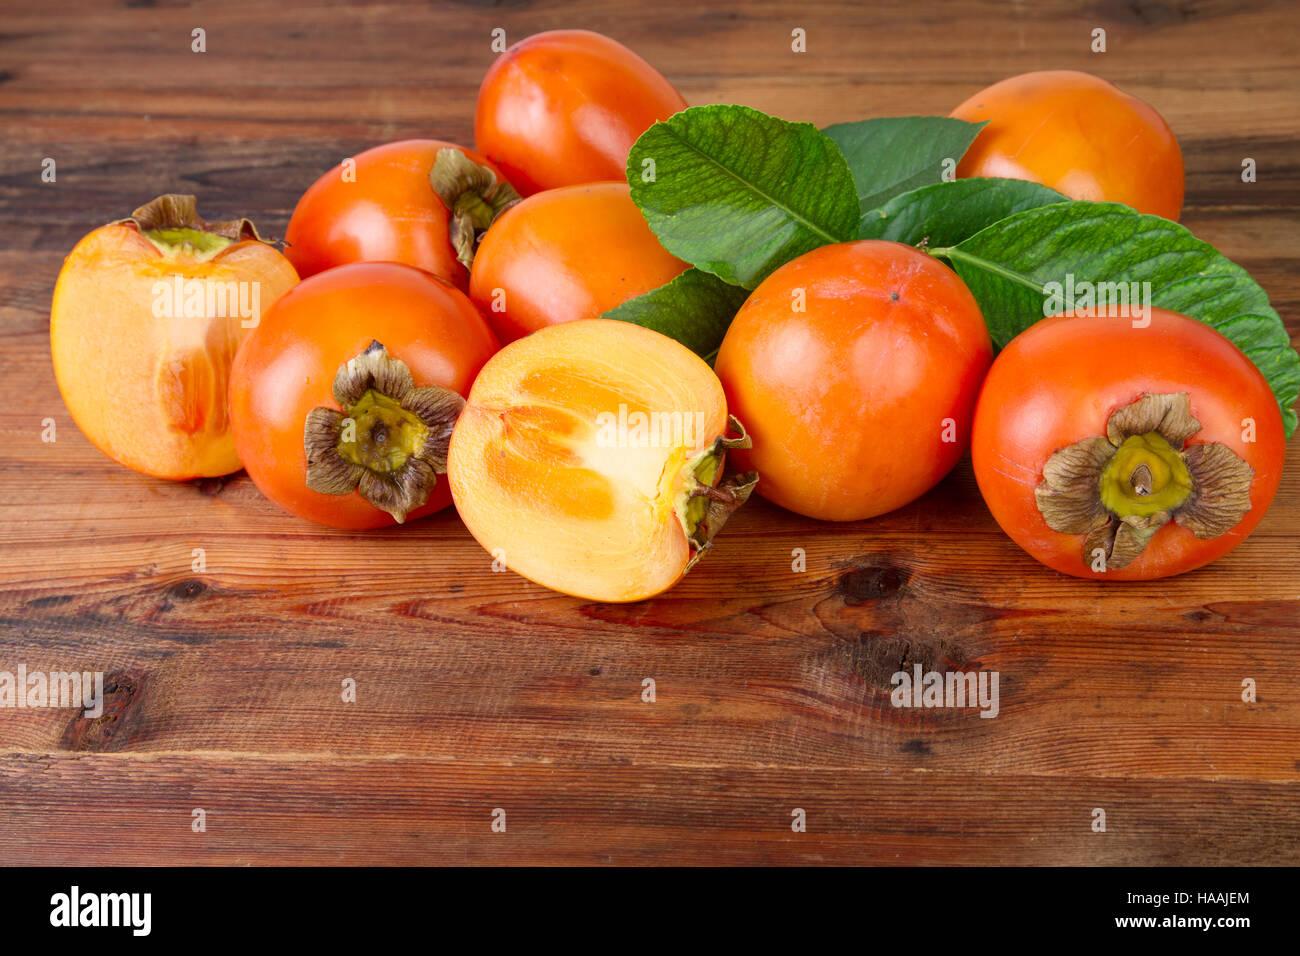 sweet kaki fruits persimmon - Stock Image